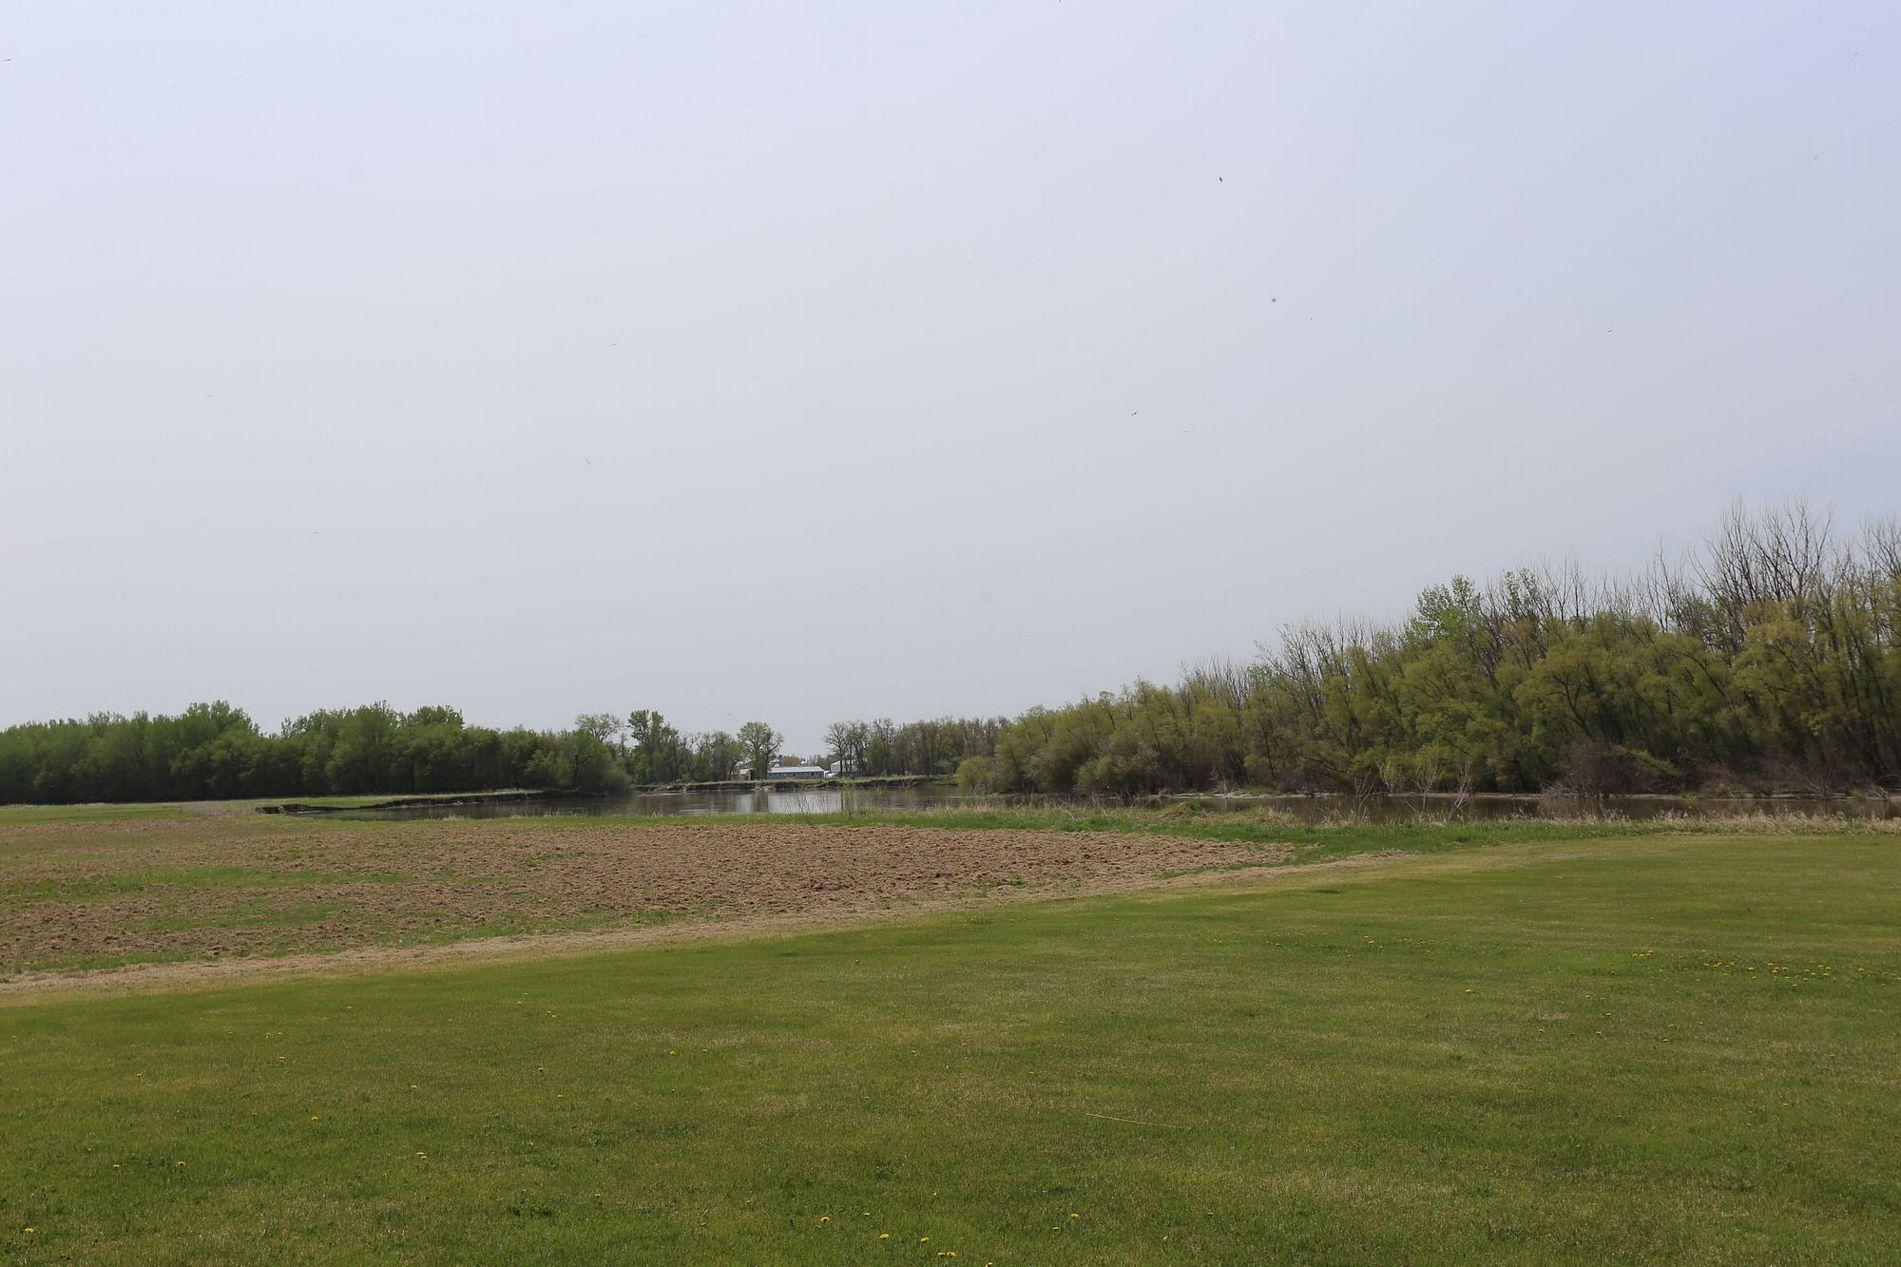 2804-Hwy 26-St Francois Xavier-Mb, Winnipeg, Manitoba  R4L 1B4 - Photo 26 - 1514217